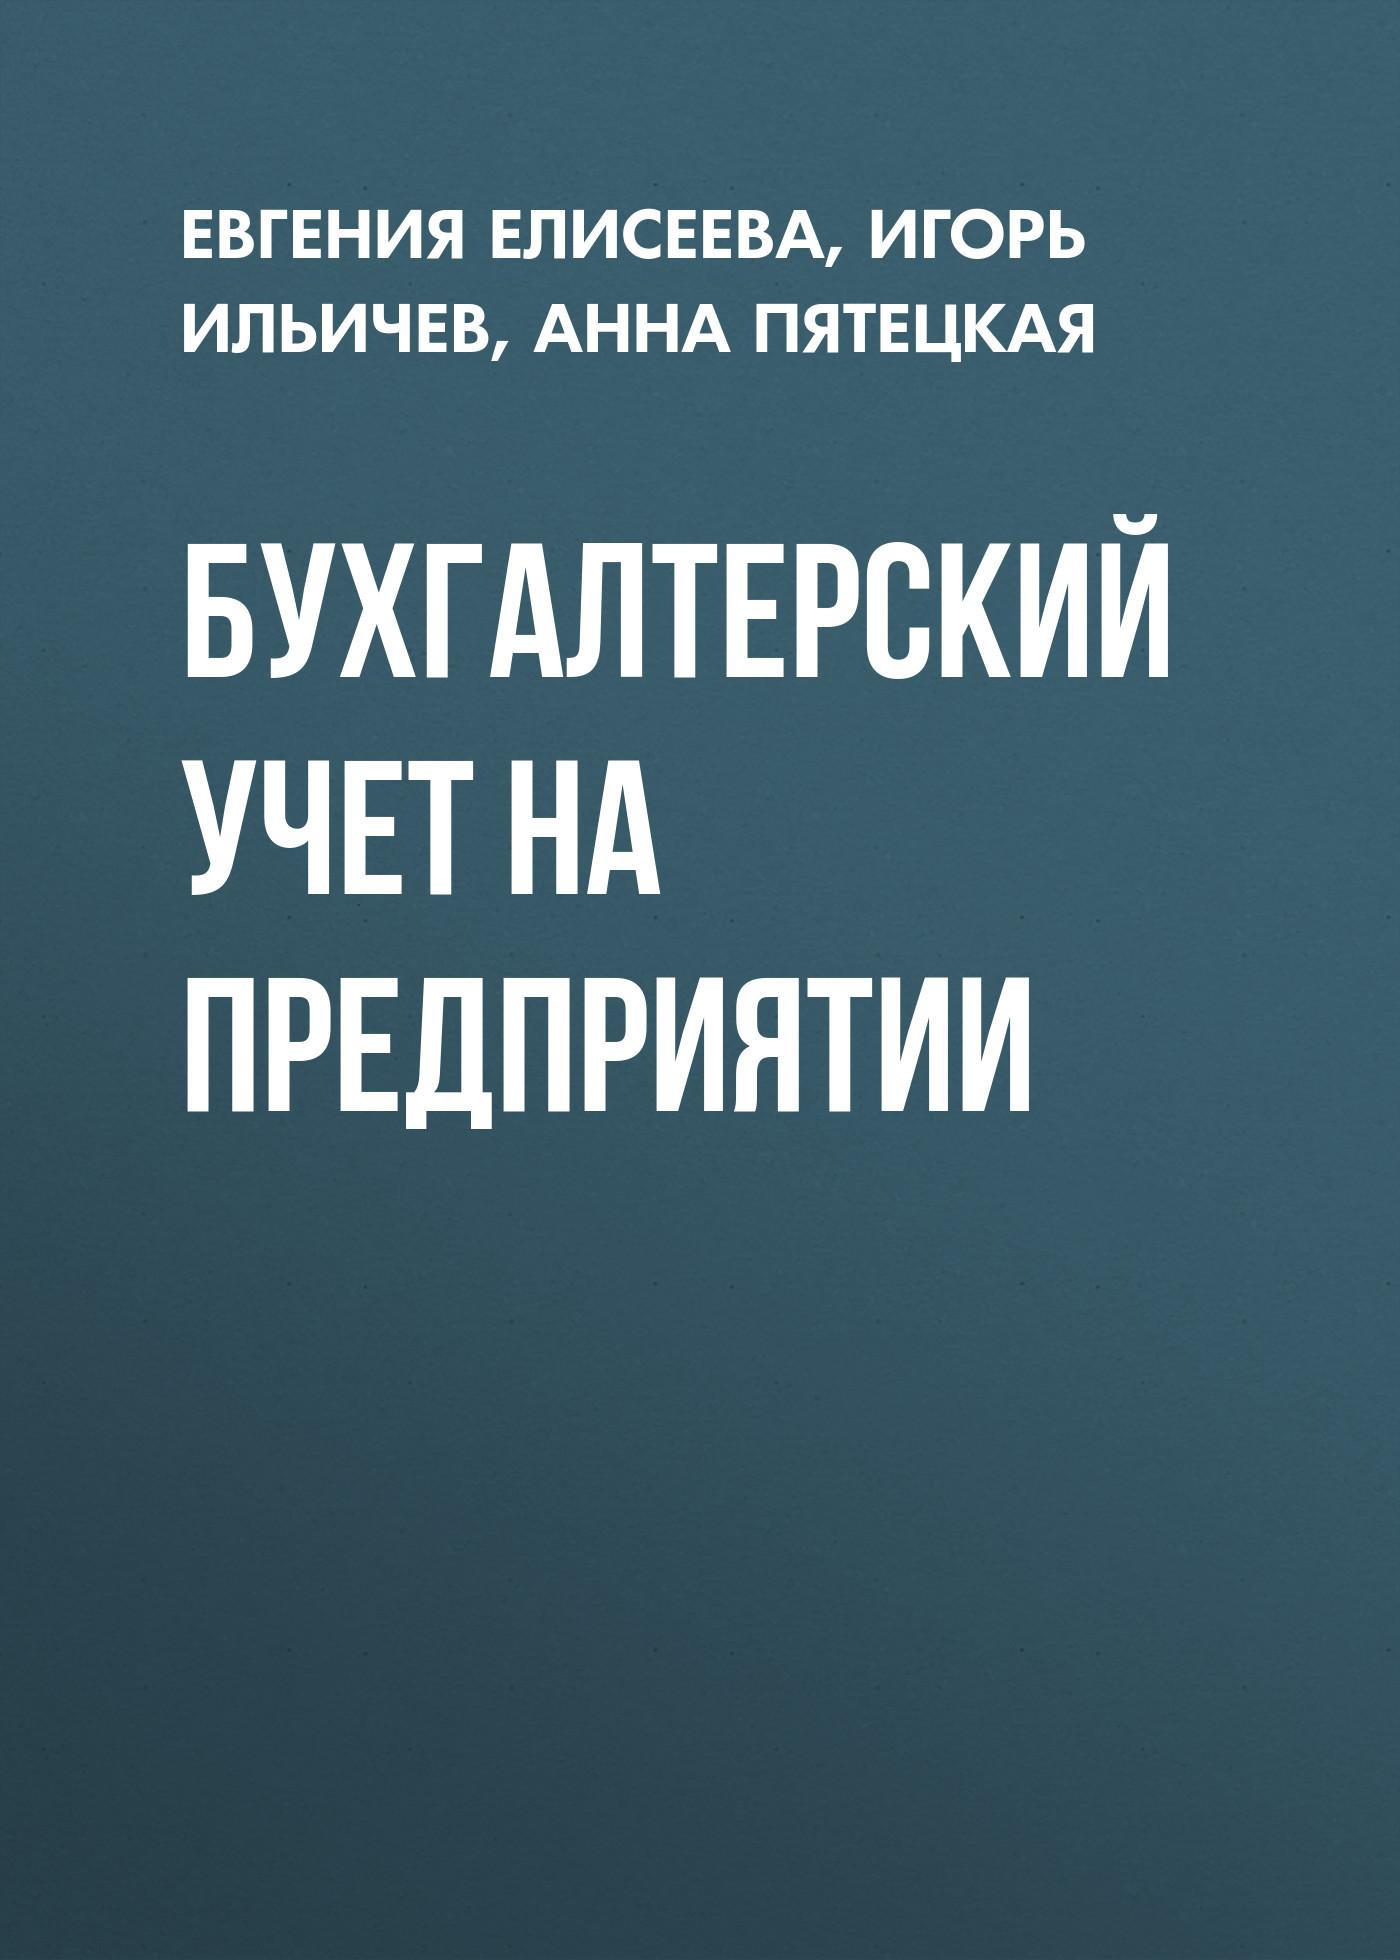 Евгения Елисеева Бухгалтерский учет на предприятии научно учебная литература